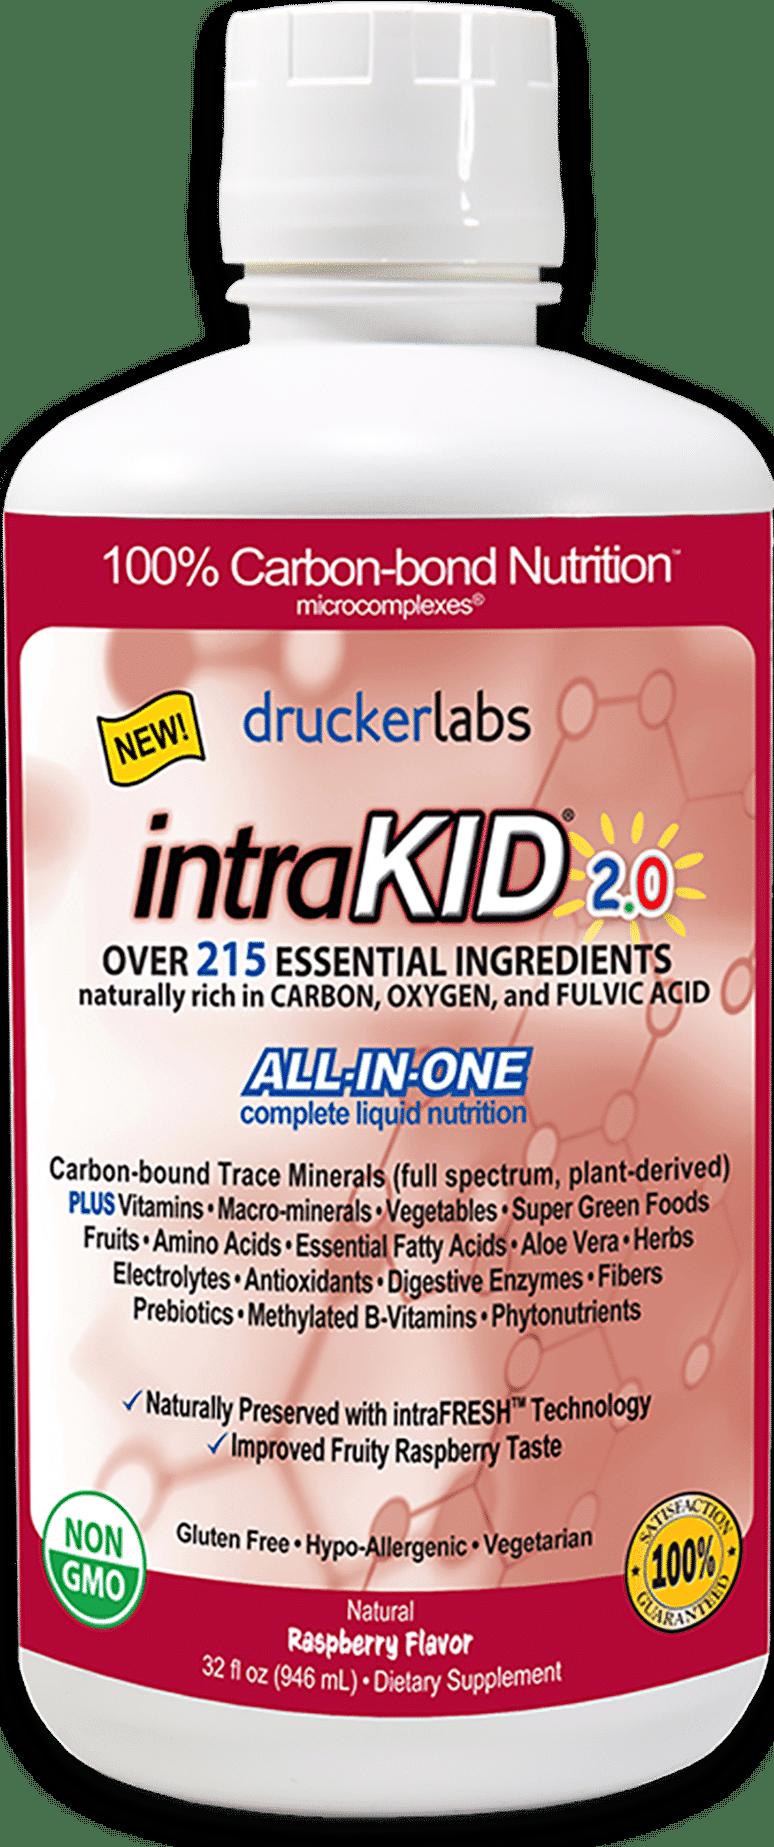 intraKID 2.0